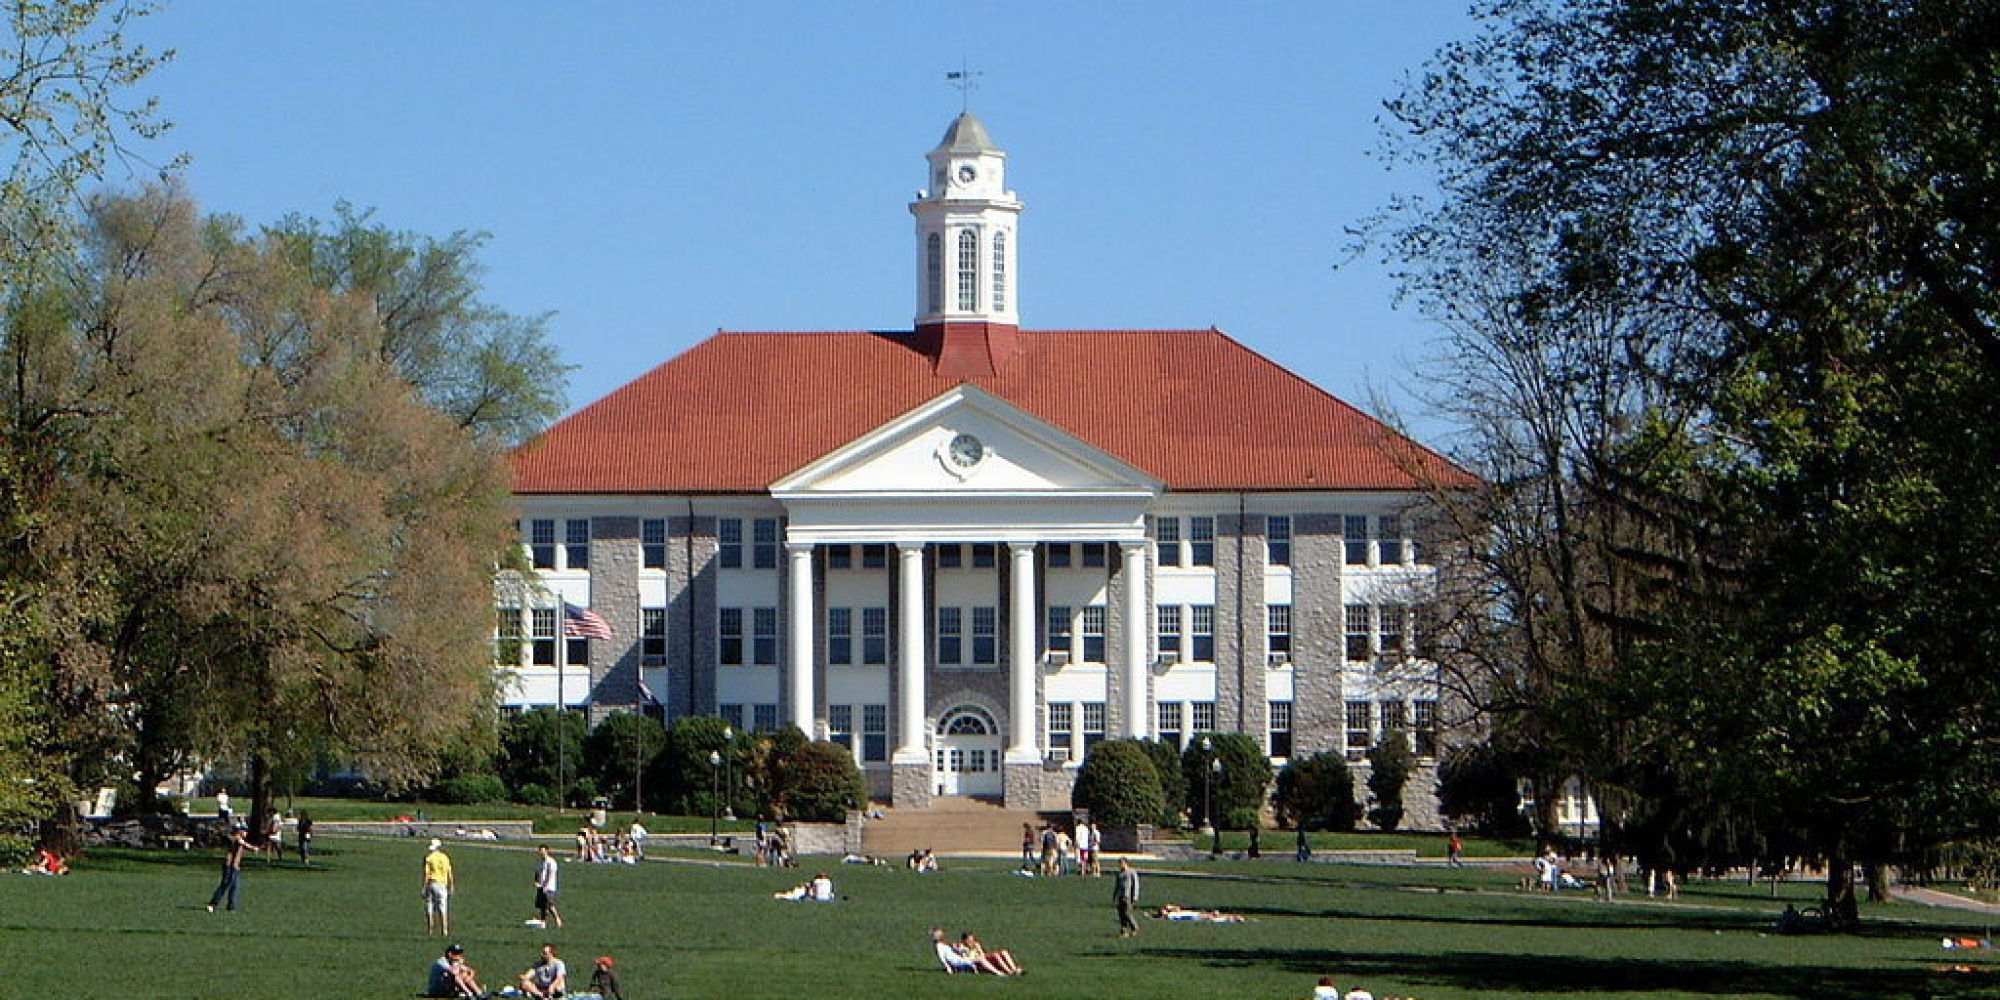 James Madison University (JMU)